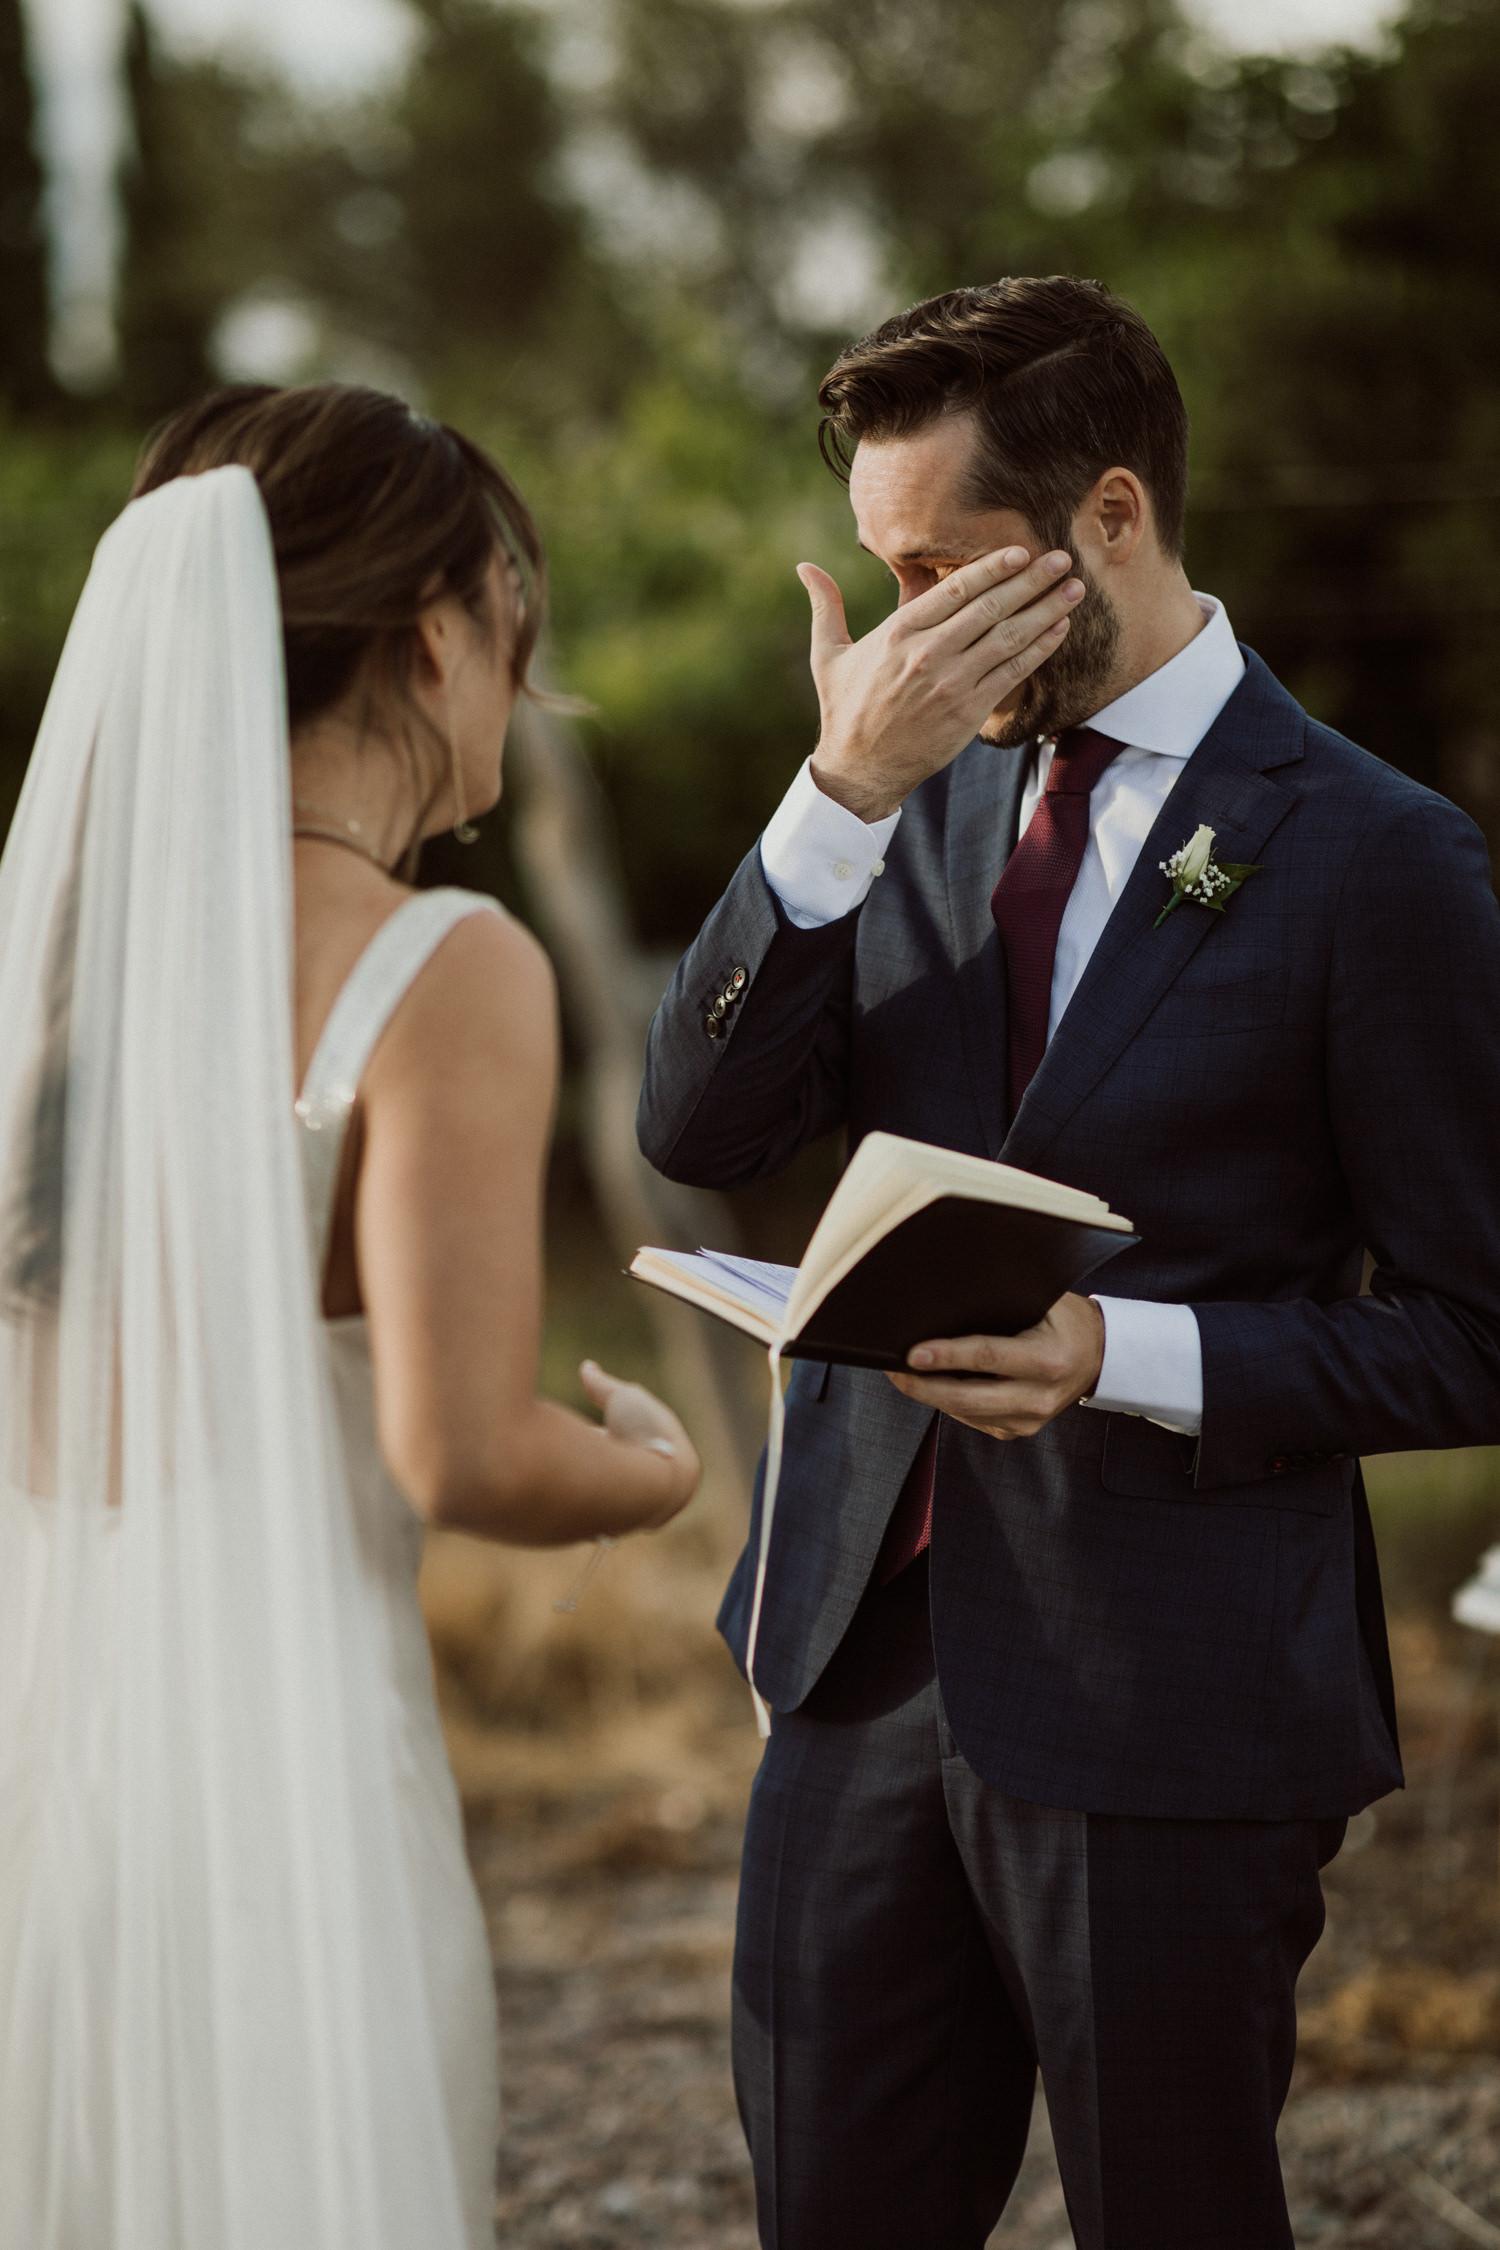 cedarandpines-kasey-erich-wedding-21.jpg